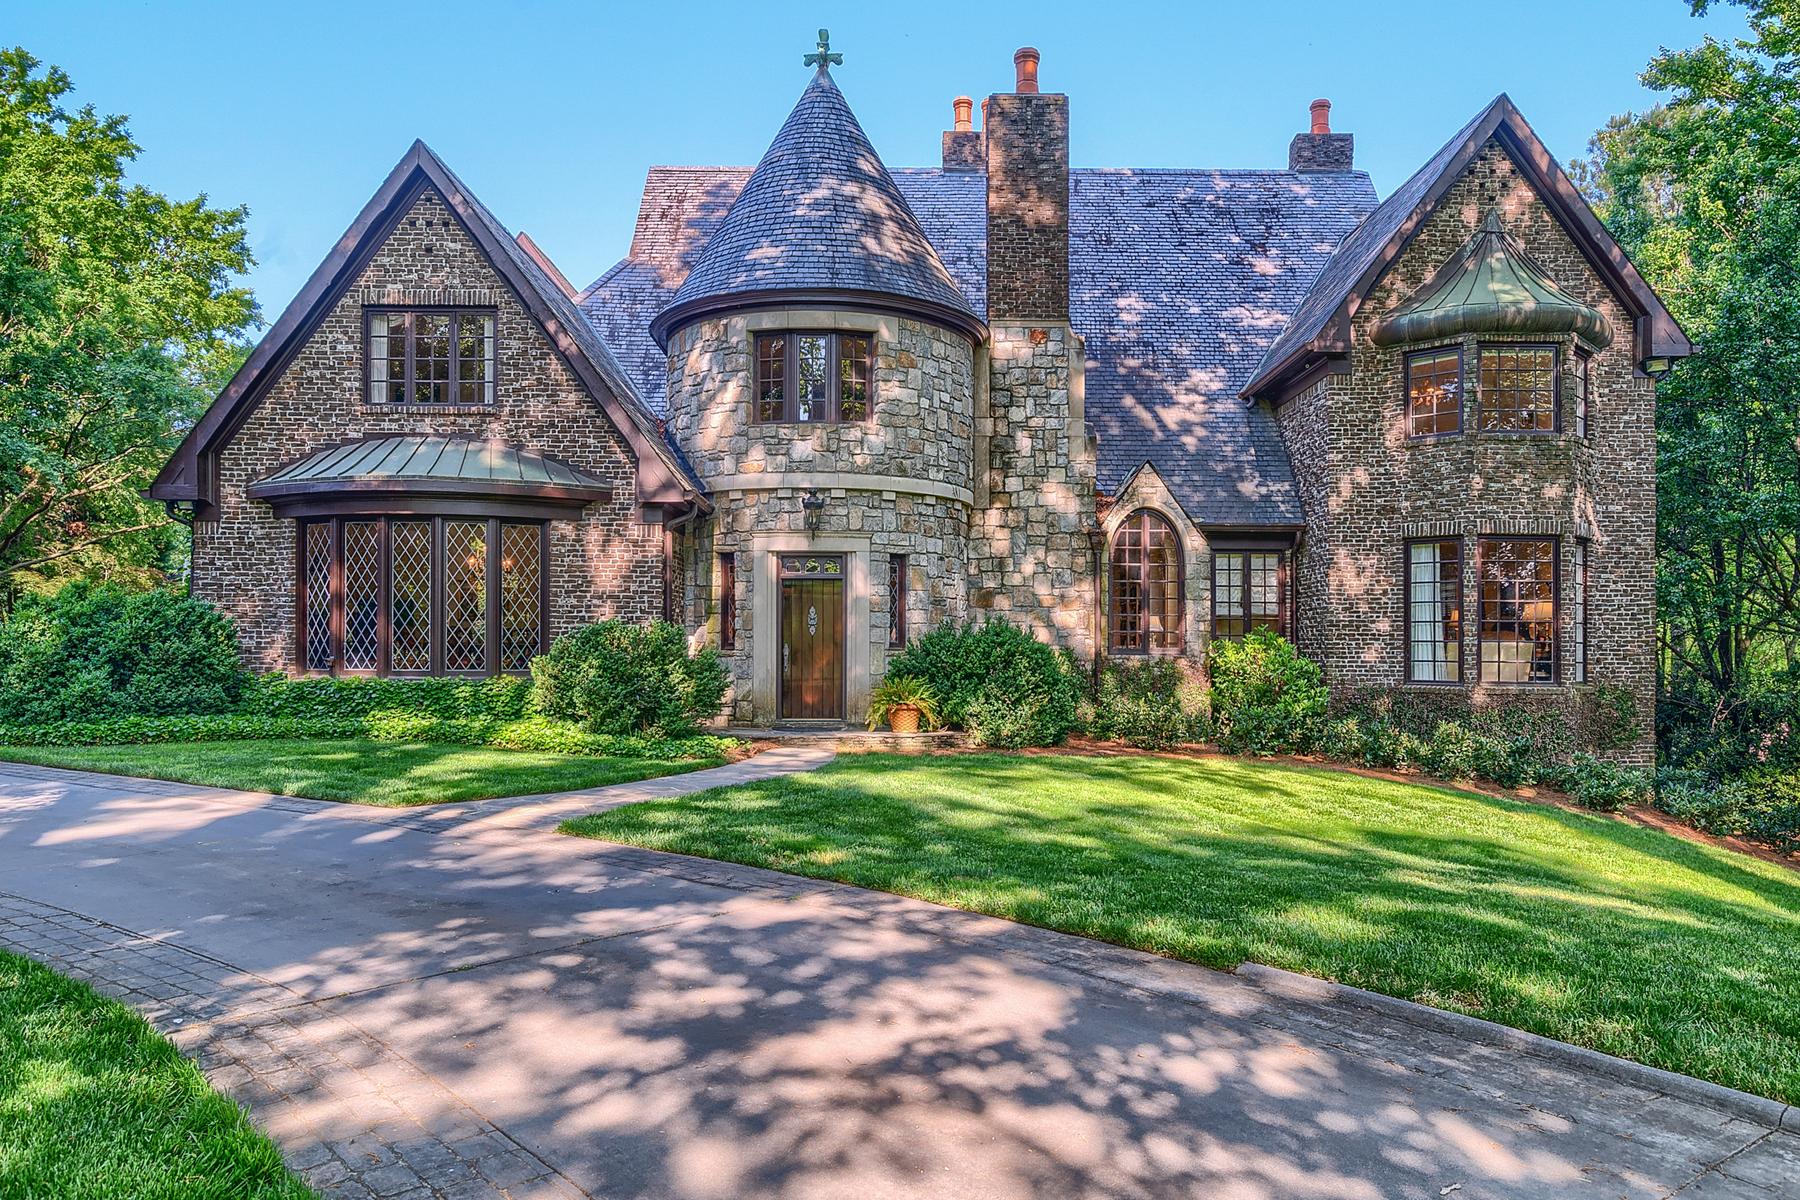 Single Family Home for Sale at An Enchanting Vinings Estate 4660 Polo Lane SE Atlanta, Georgia 30339 United States